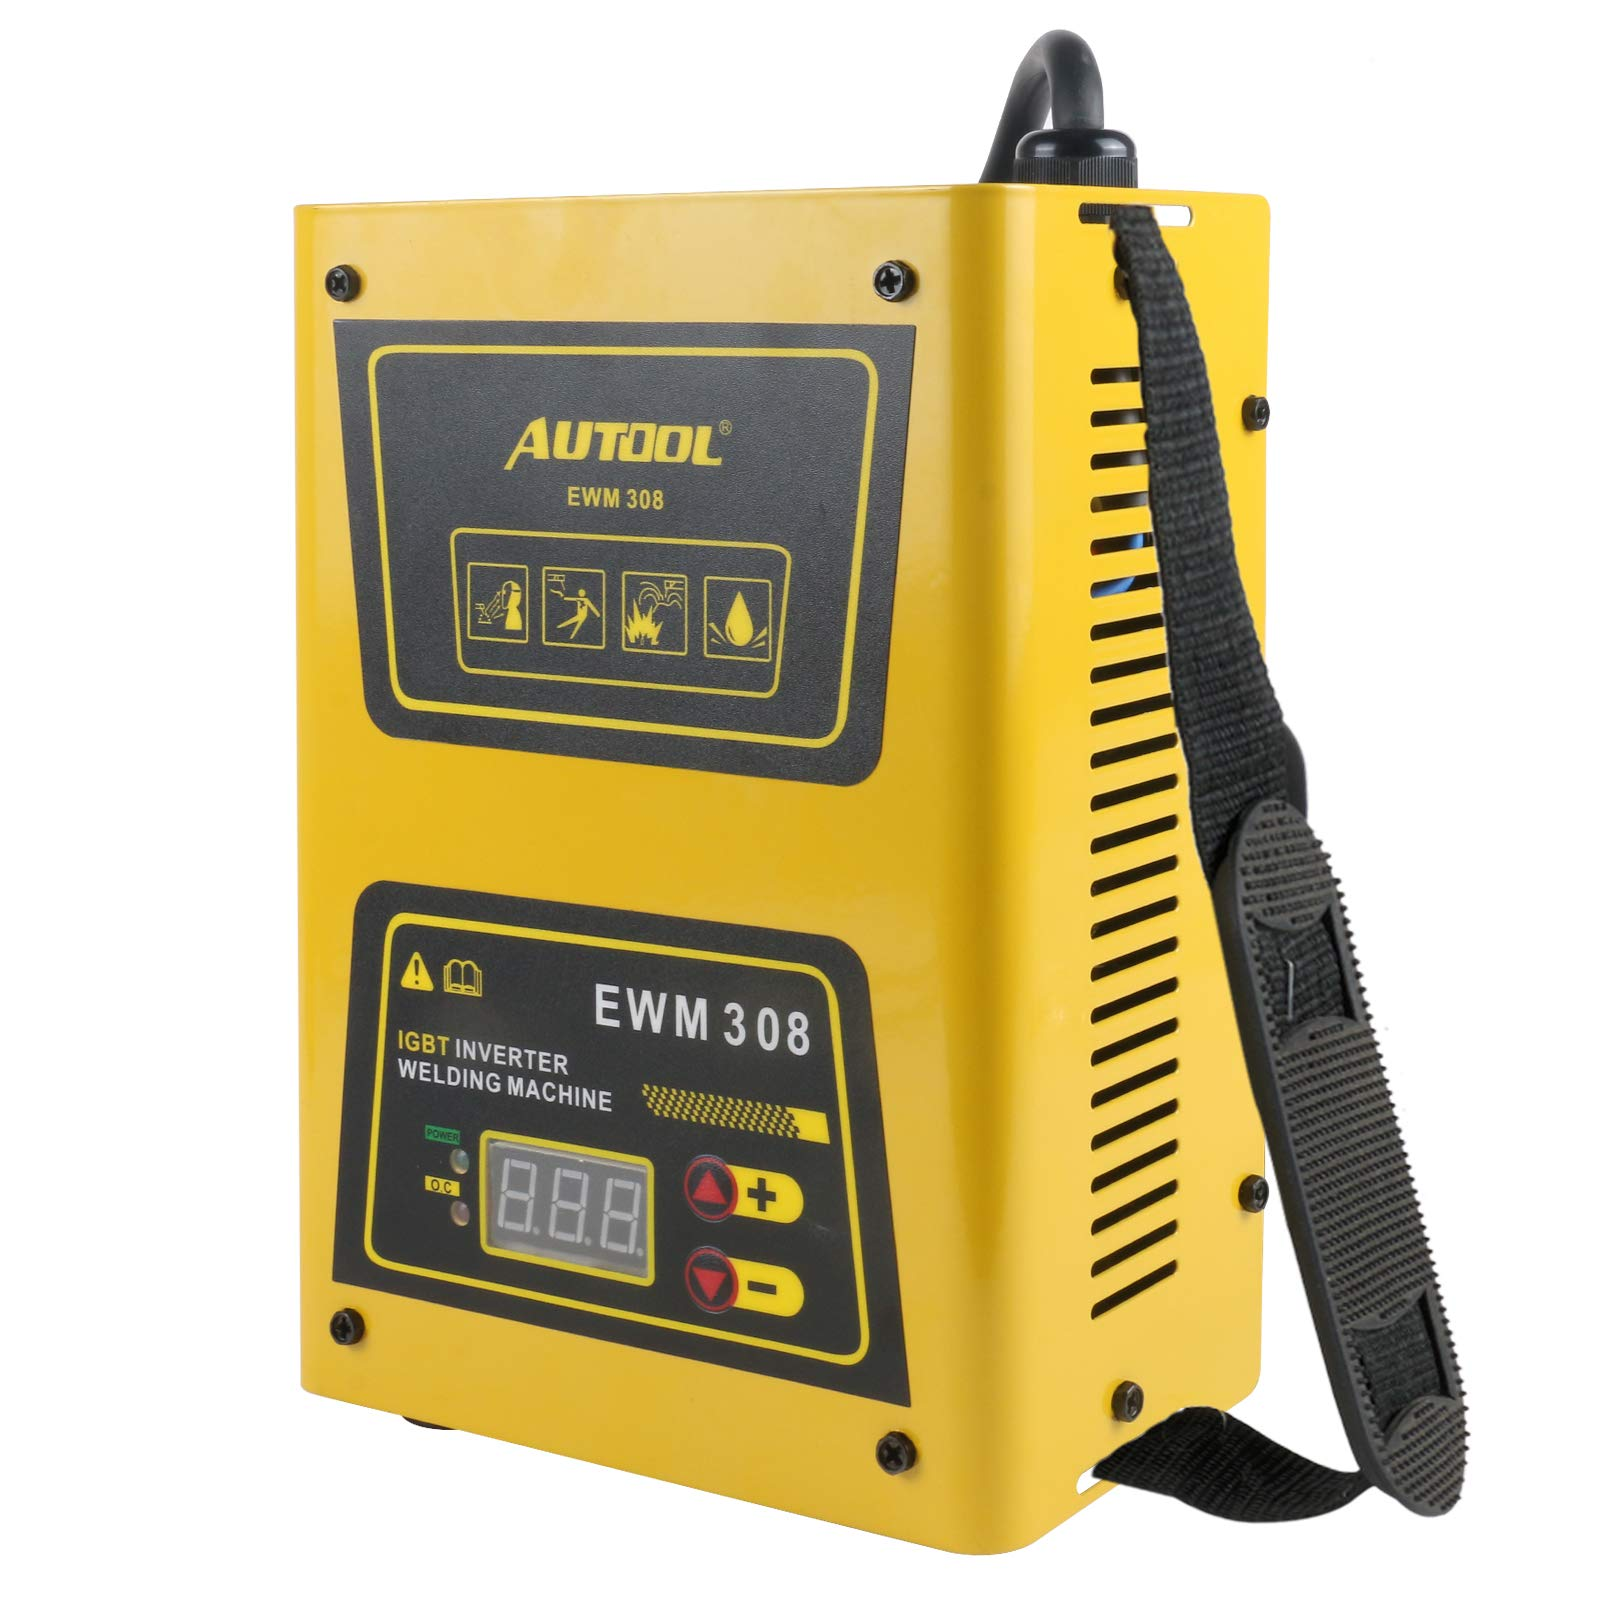 AUTOOL EWM-308 Portable ARC Inverter Welder, 20-140Amp IGBT Welding Machine Kit, AC 220V Mini Electric Stick Welder (EU Socket)